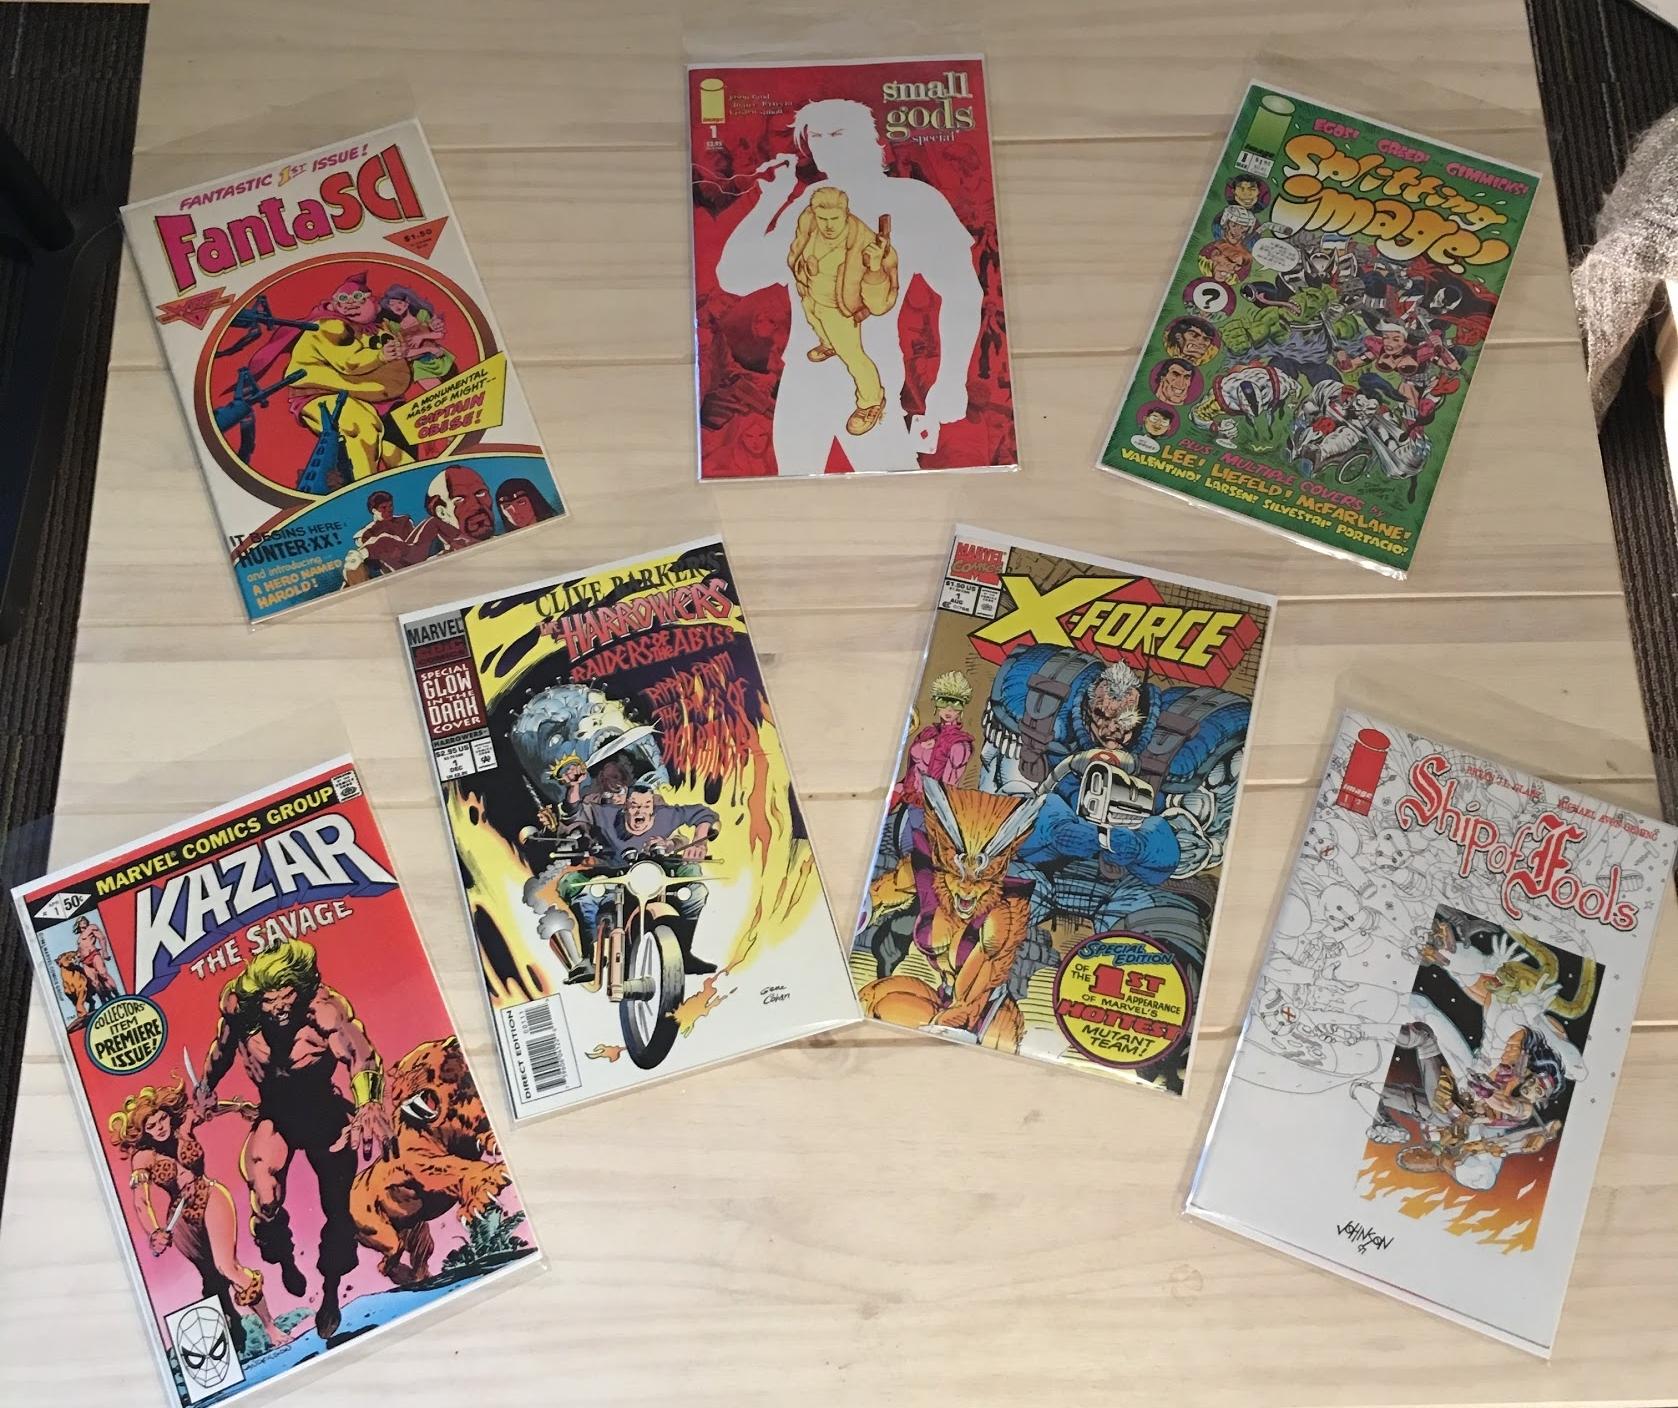 Keith's Comics